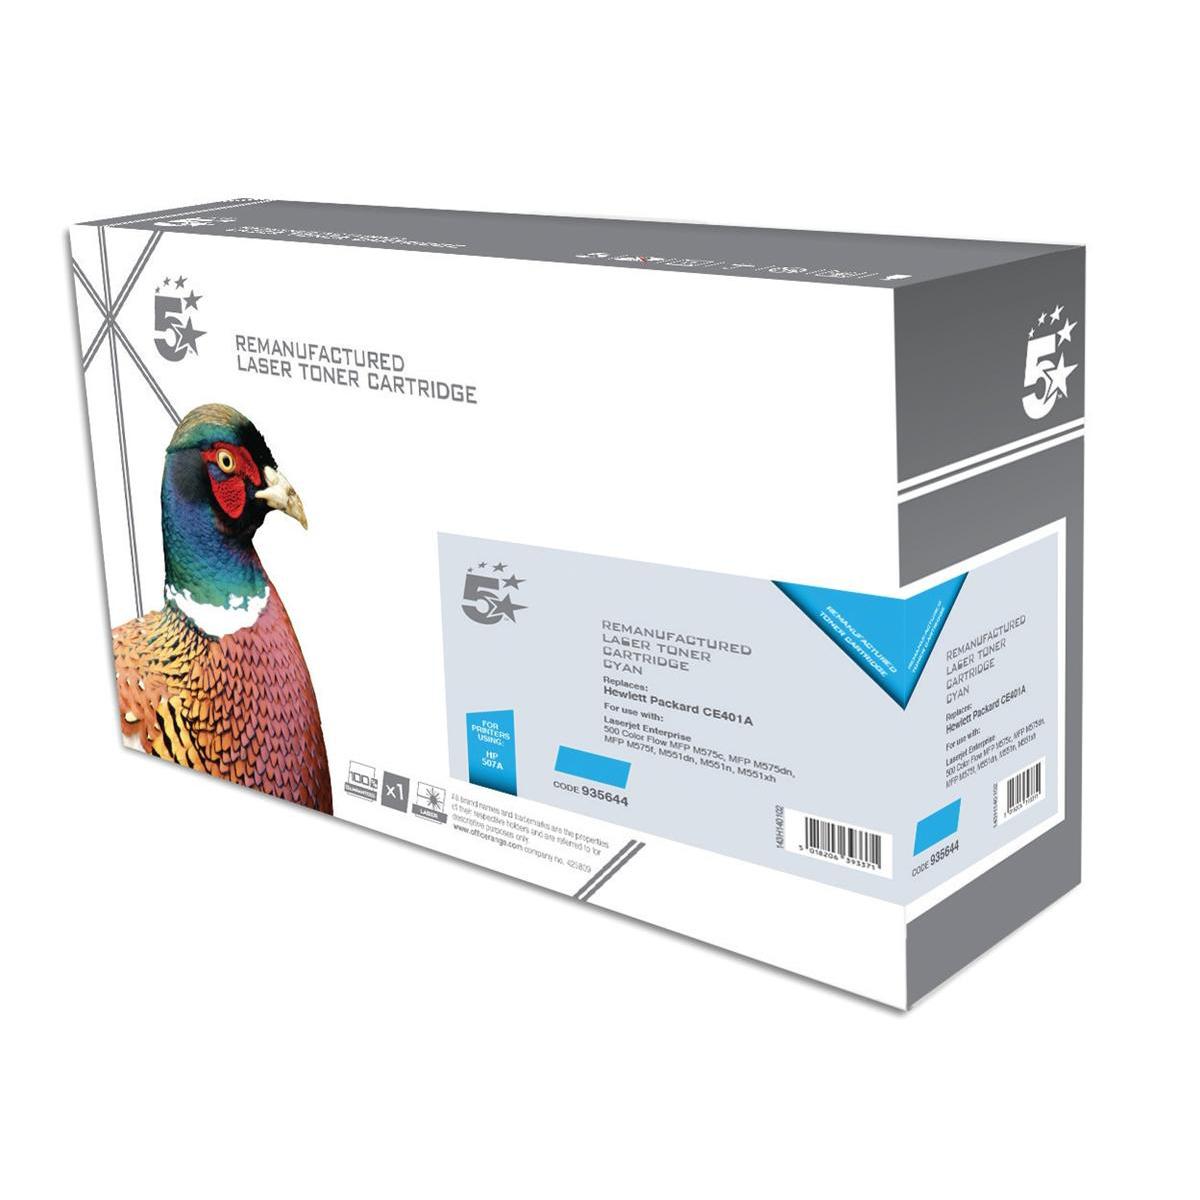 5 Star Office Remanufactured Laser Toner Cartridge 6000pp Cyan [HP 507A CE401A Alternative]